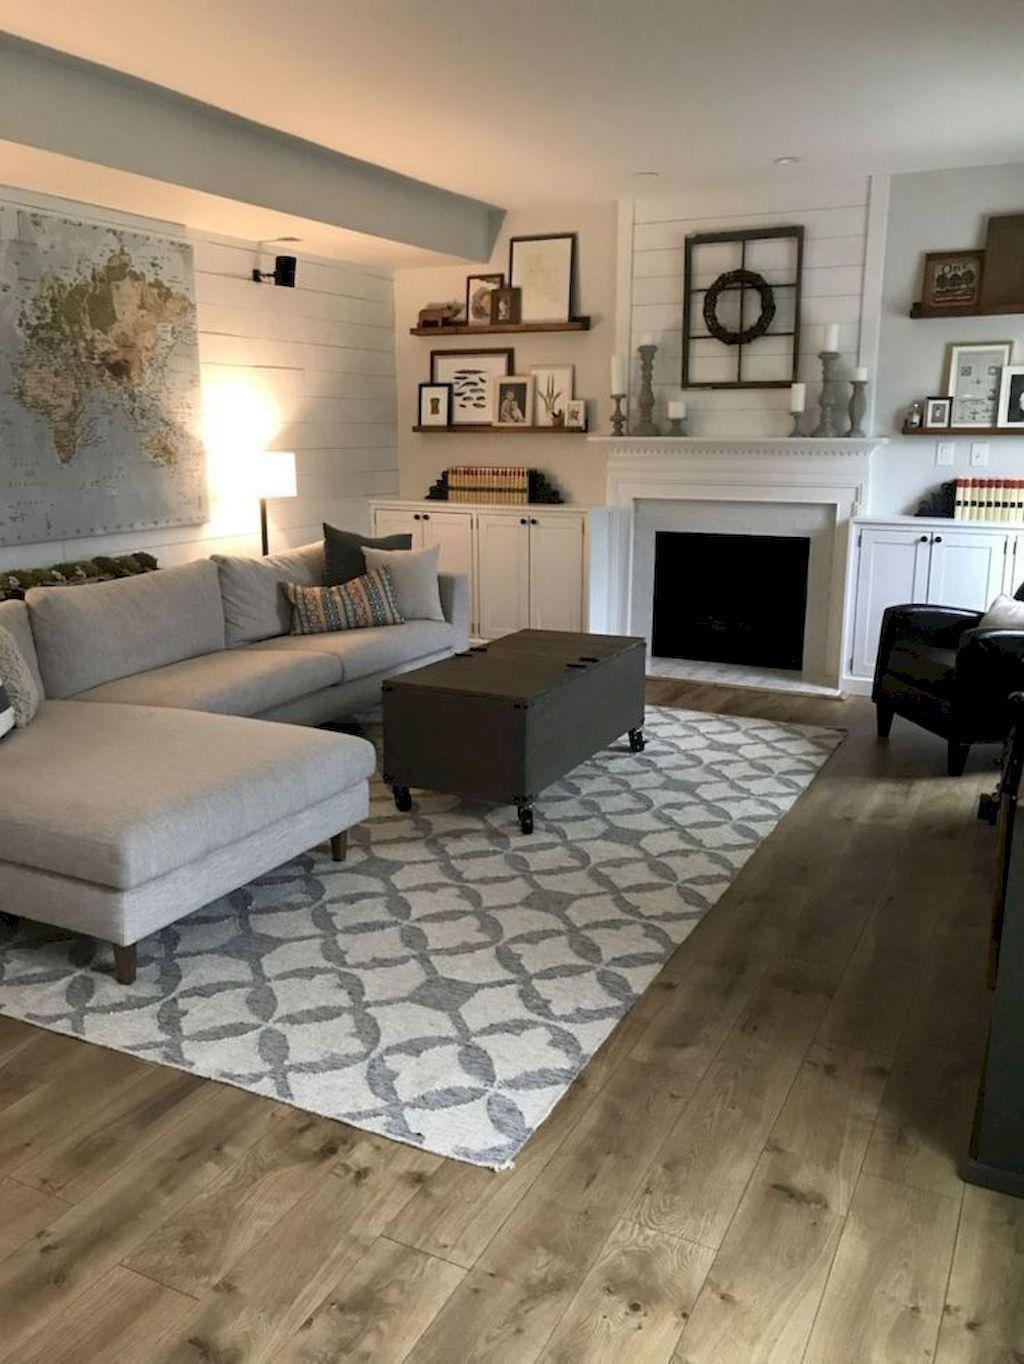 fabulous living room swingland nod for hom   20+ Fabulous Living Room Arrangement Ideas   For the Home ...